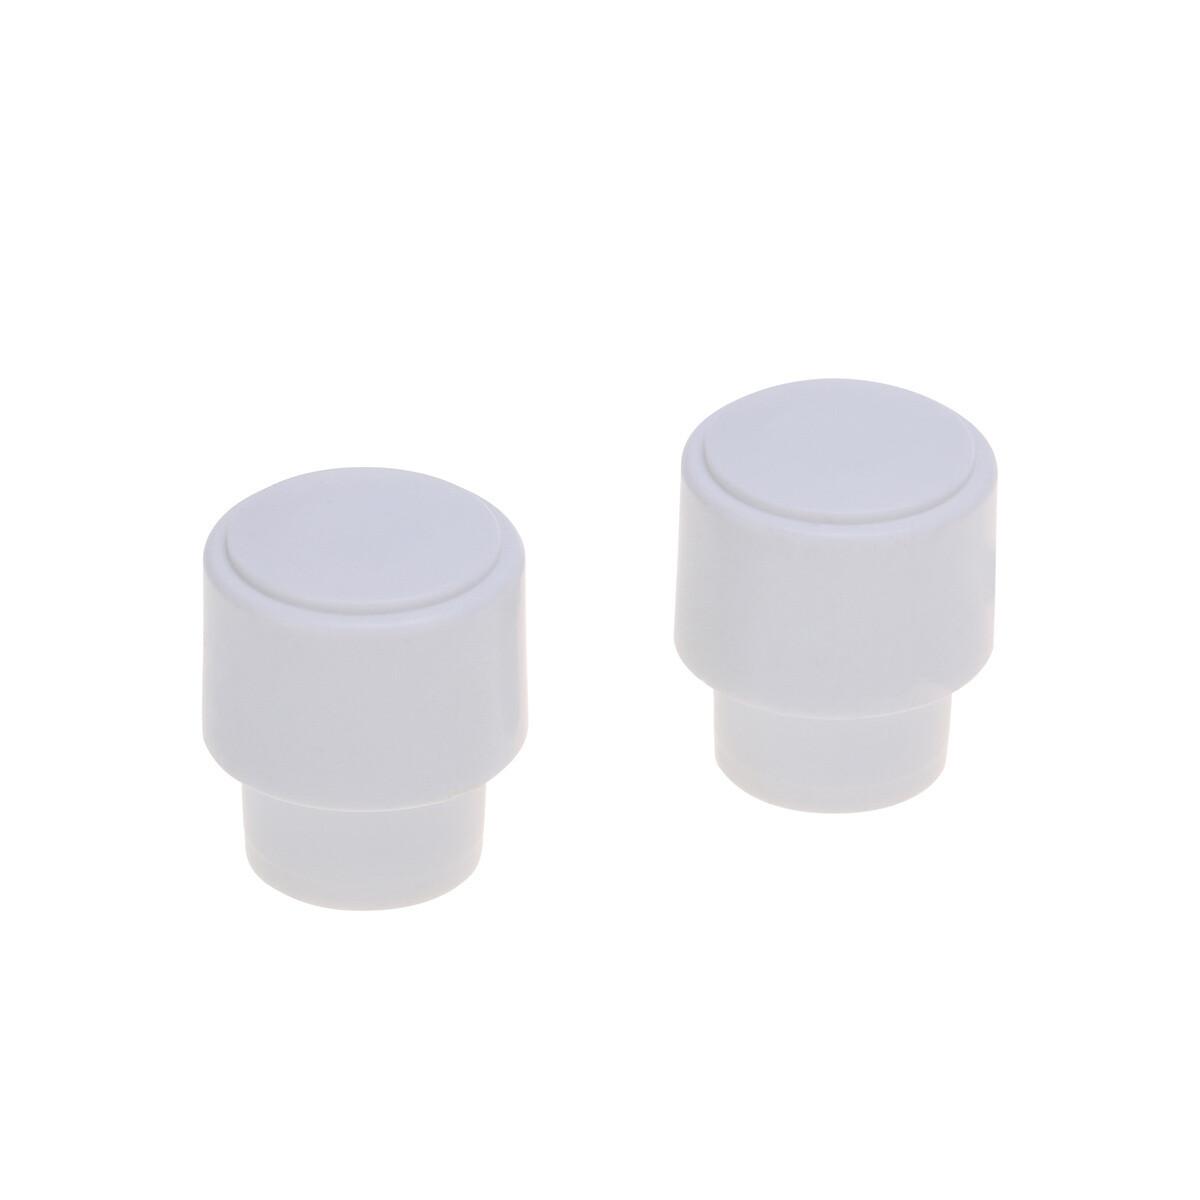 1 x USA Size Telecaster Barrel Switch Tip ( CRL ) White